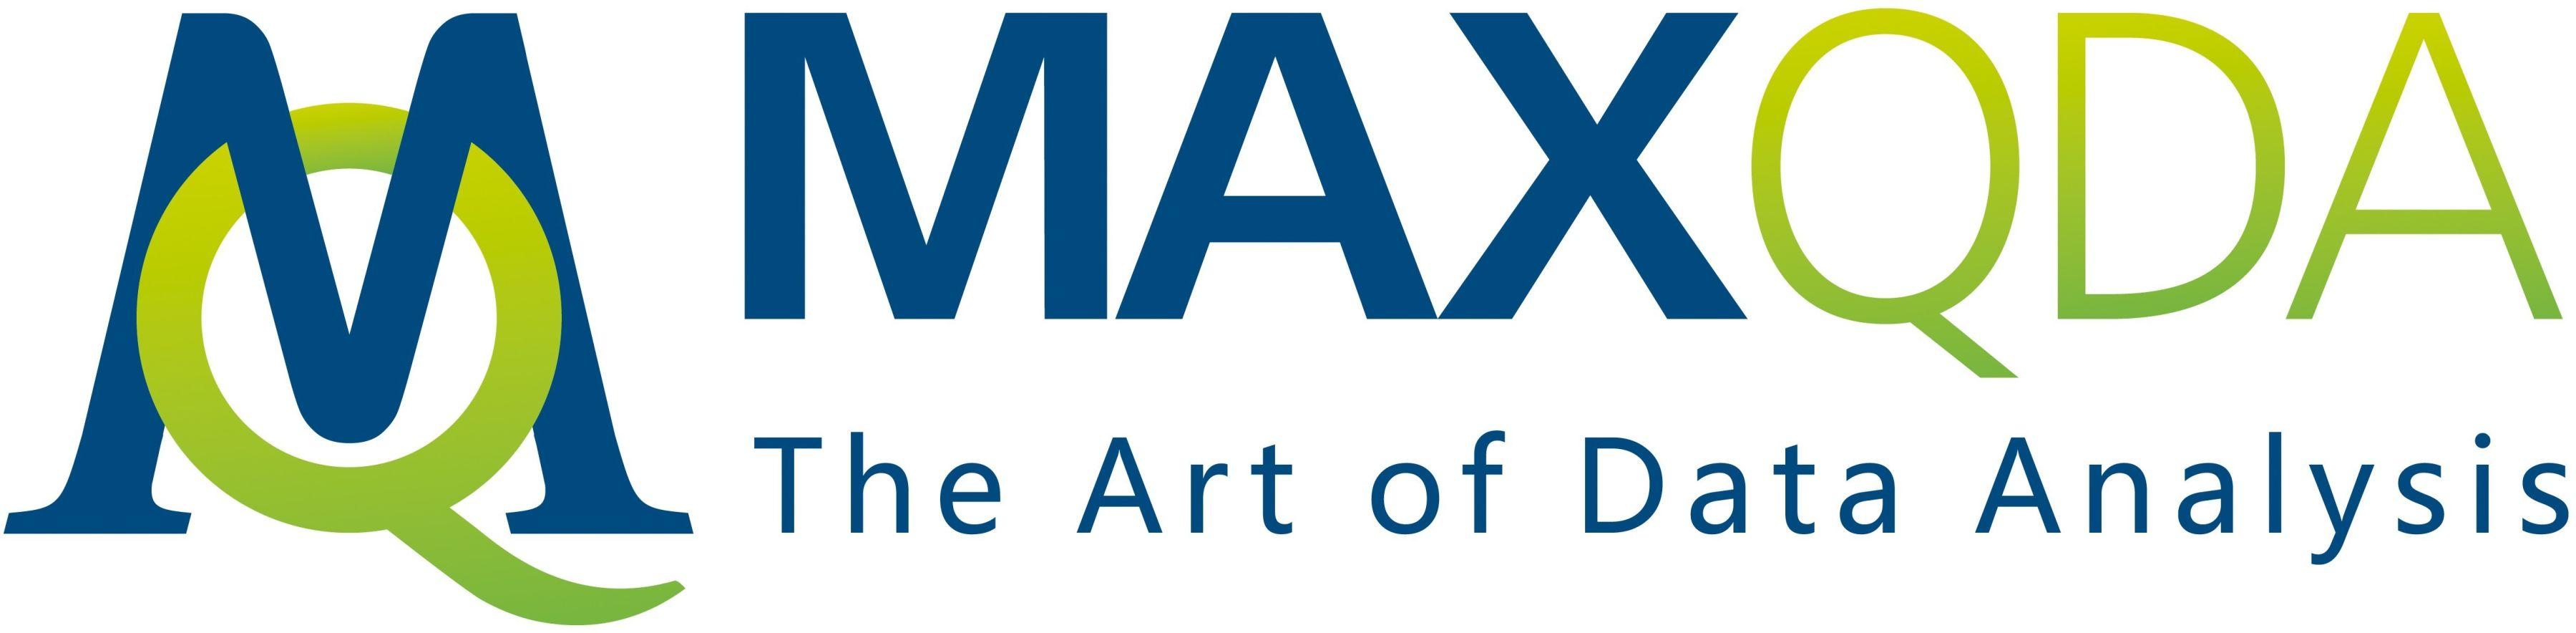 MAXQDA Plus dla Firm i Instytucji - Certyfikaty Rzetelna Firma i Adobe Gold Reseller